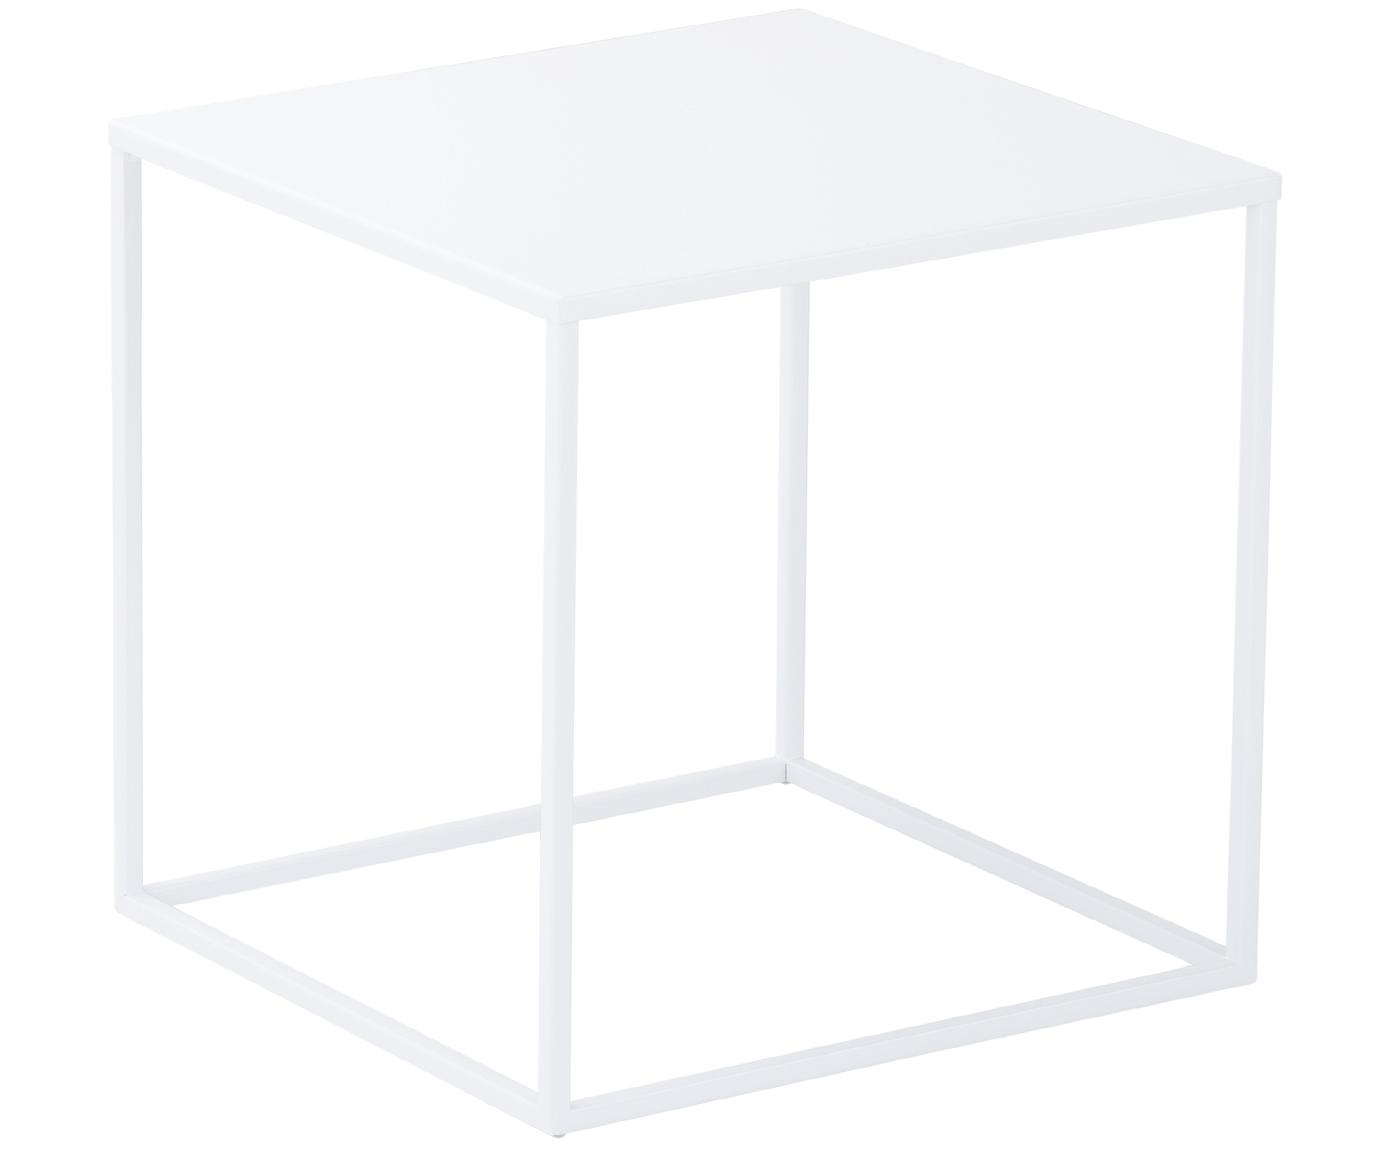 Tavolino in metallo bianco Stina, Metallo verniciato a polvere, Bianco opaco, Larg. 45 x Alt. 45 cm